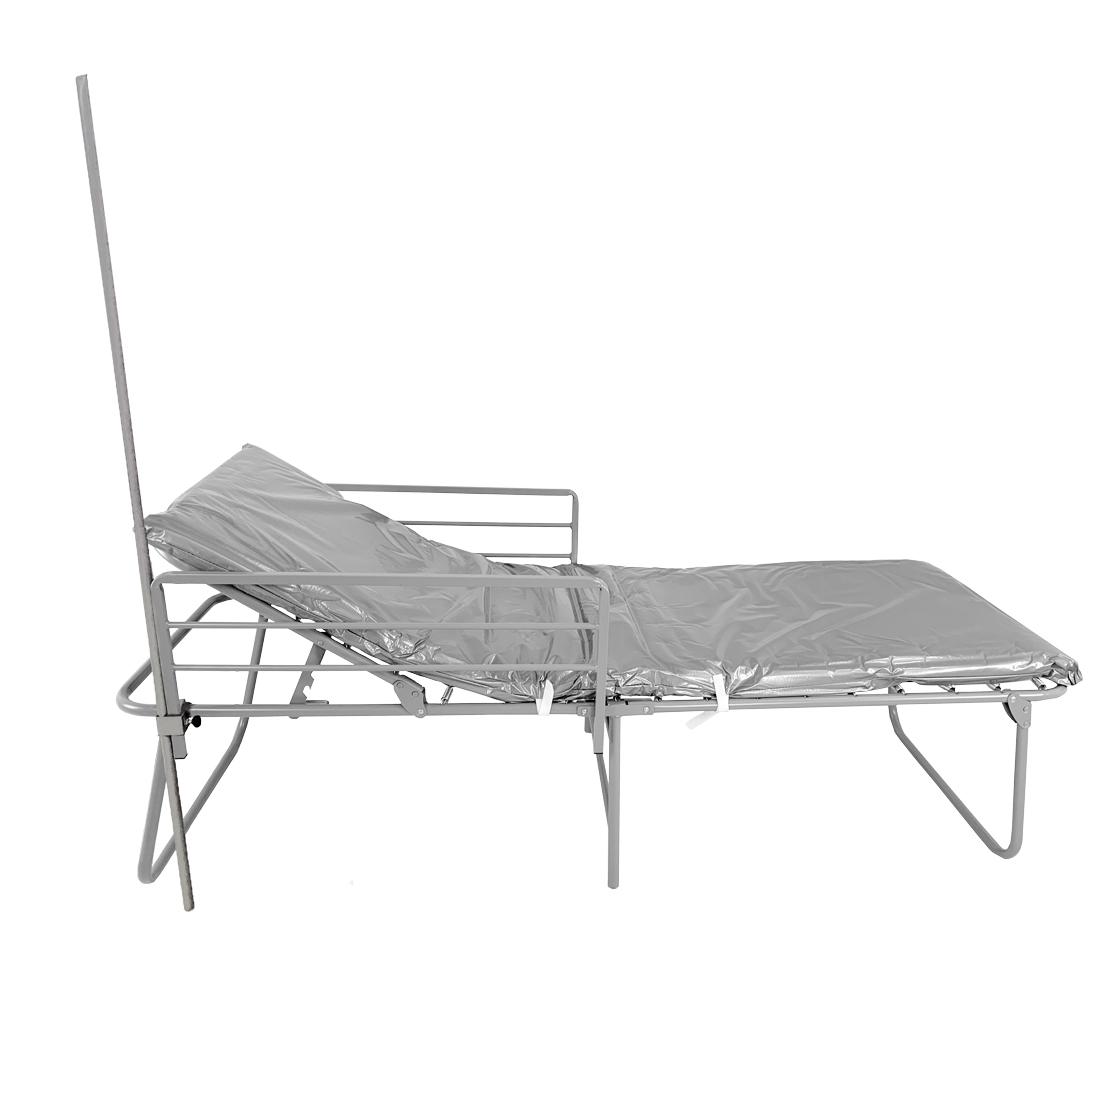 FEMA-ADA Cot with Side Rails and IV Pole image